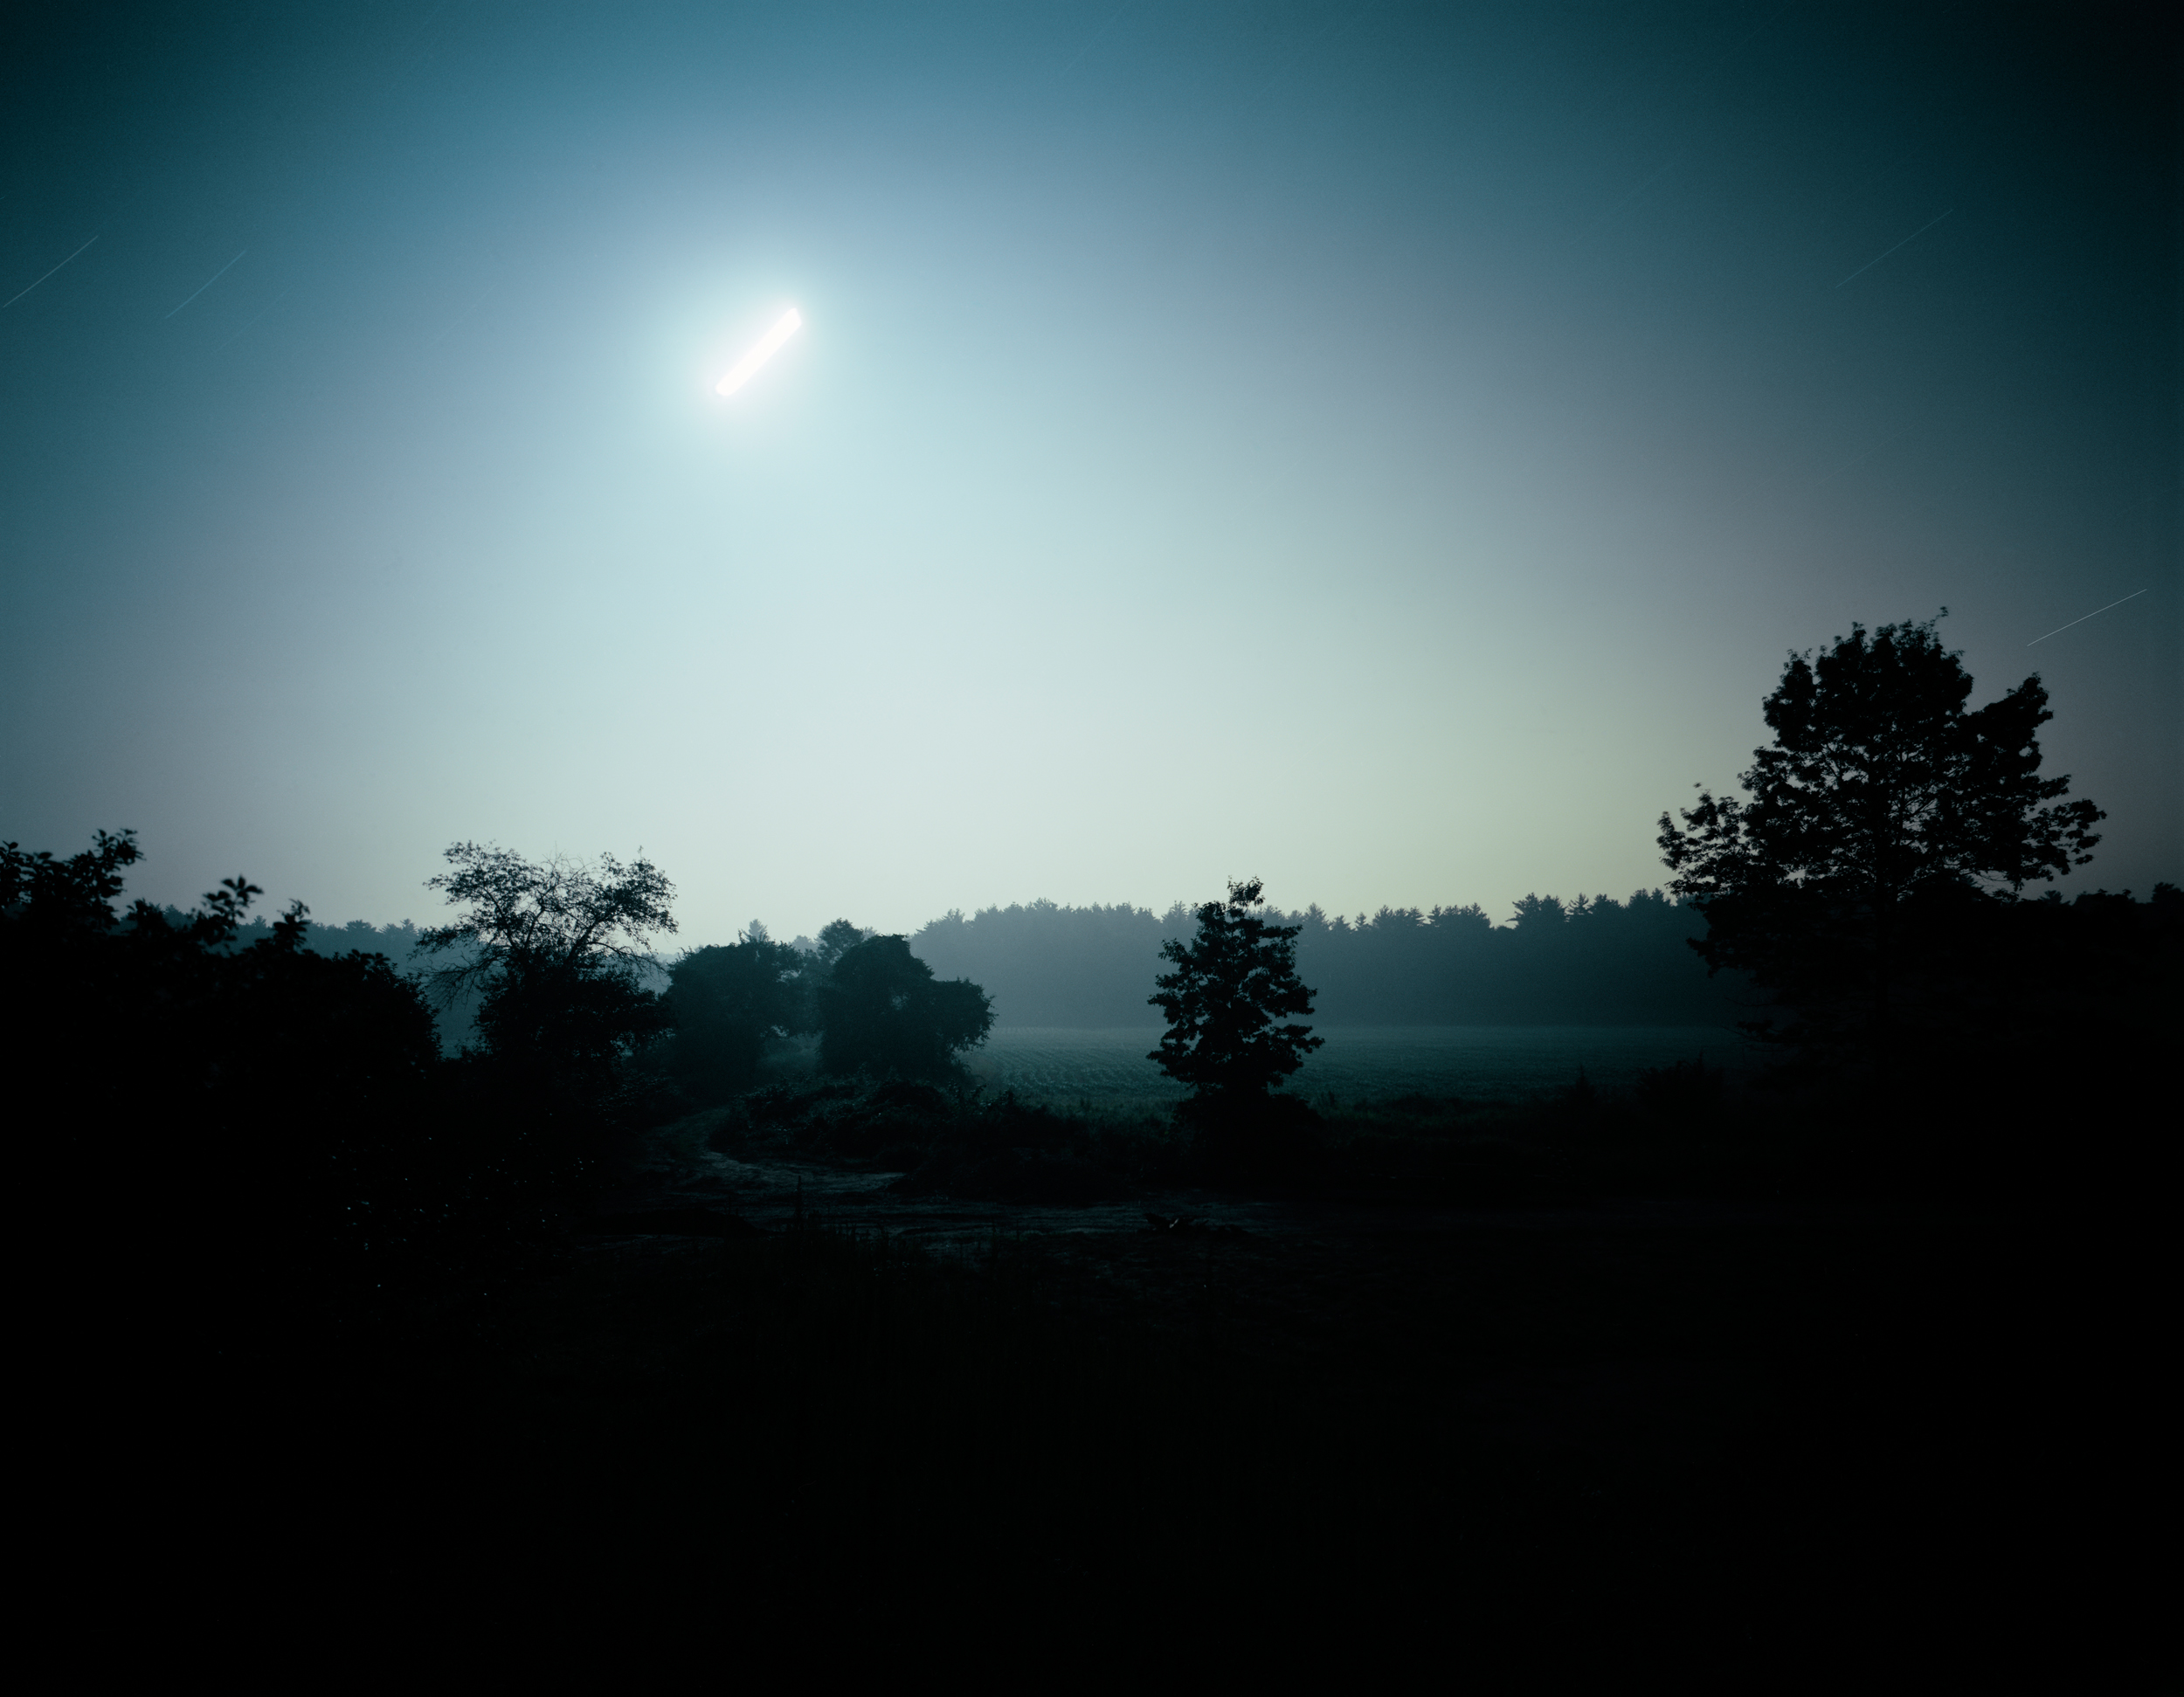 06-255 Meadow, vista, moon rising (the night the bird sang), full.jpg